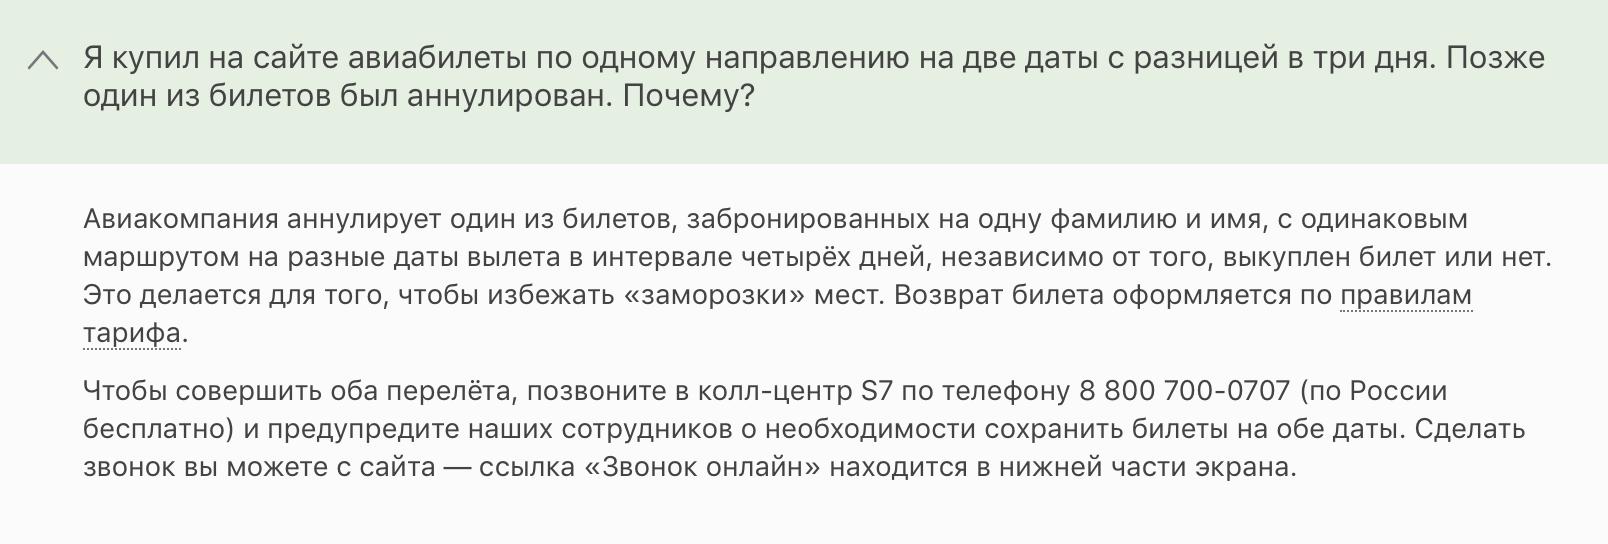 Купить авиабилет мурманск санкт петербург аэрофлот